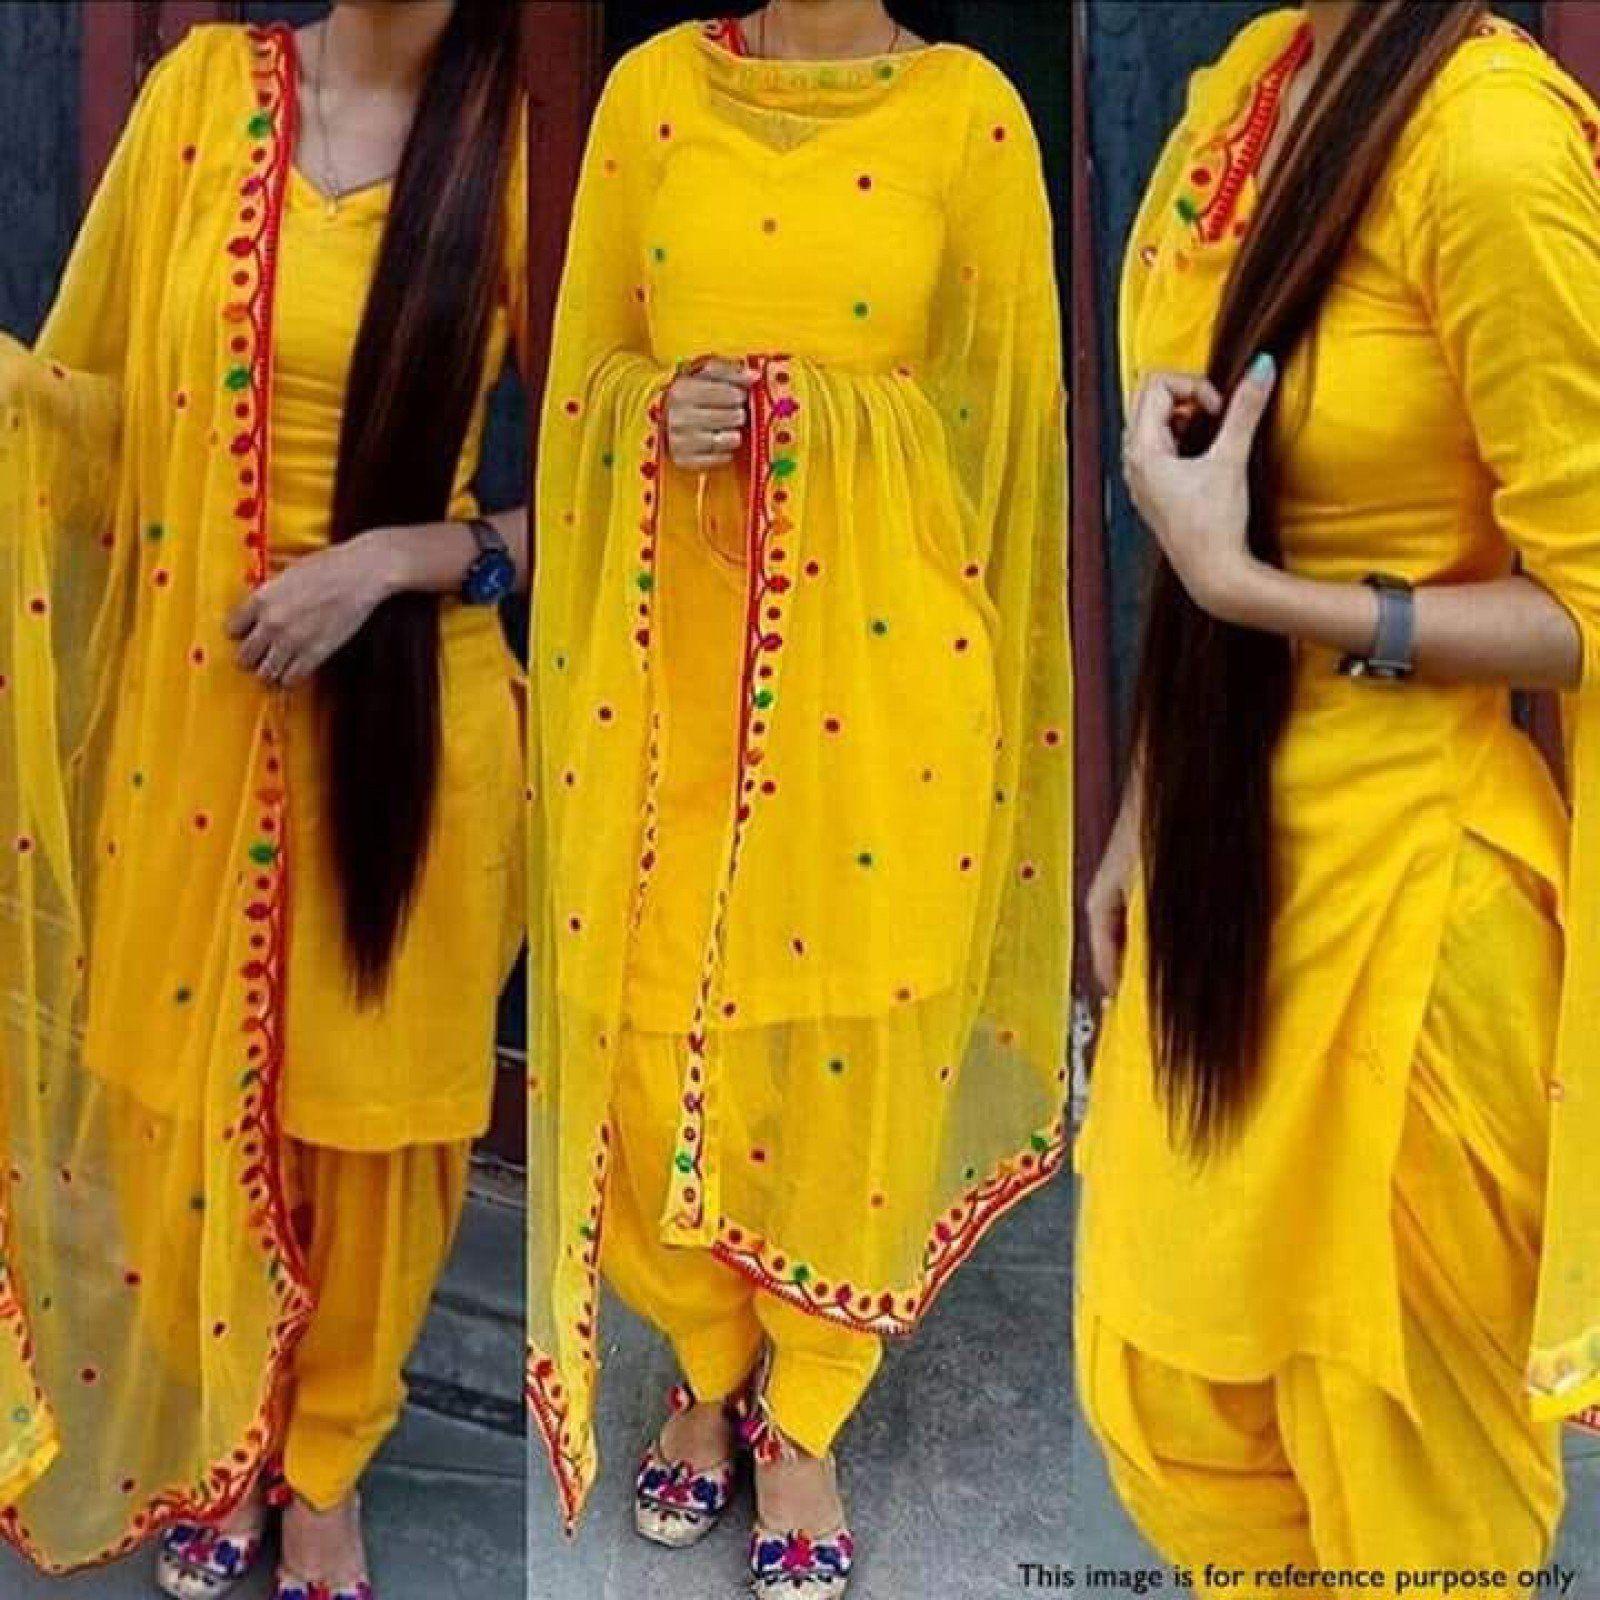 9556ce887b New yellow color pure cotton plain patiala suit unstitched material with  dupatta. #Patialasuit #Unstitchedsuit #Punjabisuit #Dressmaterial